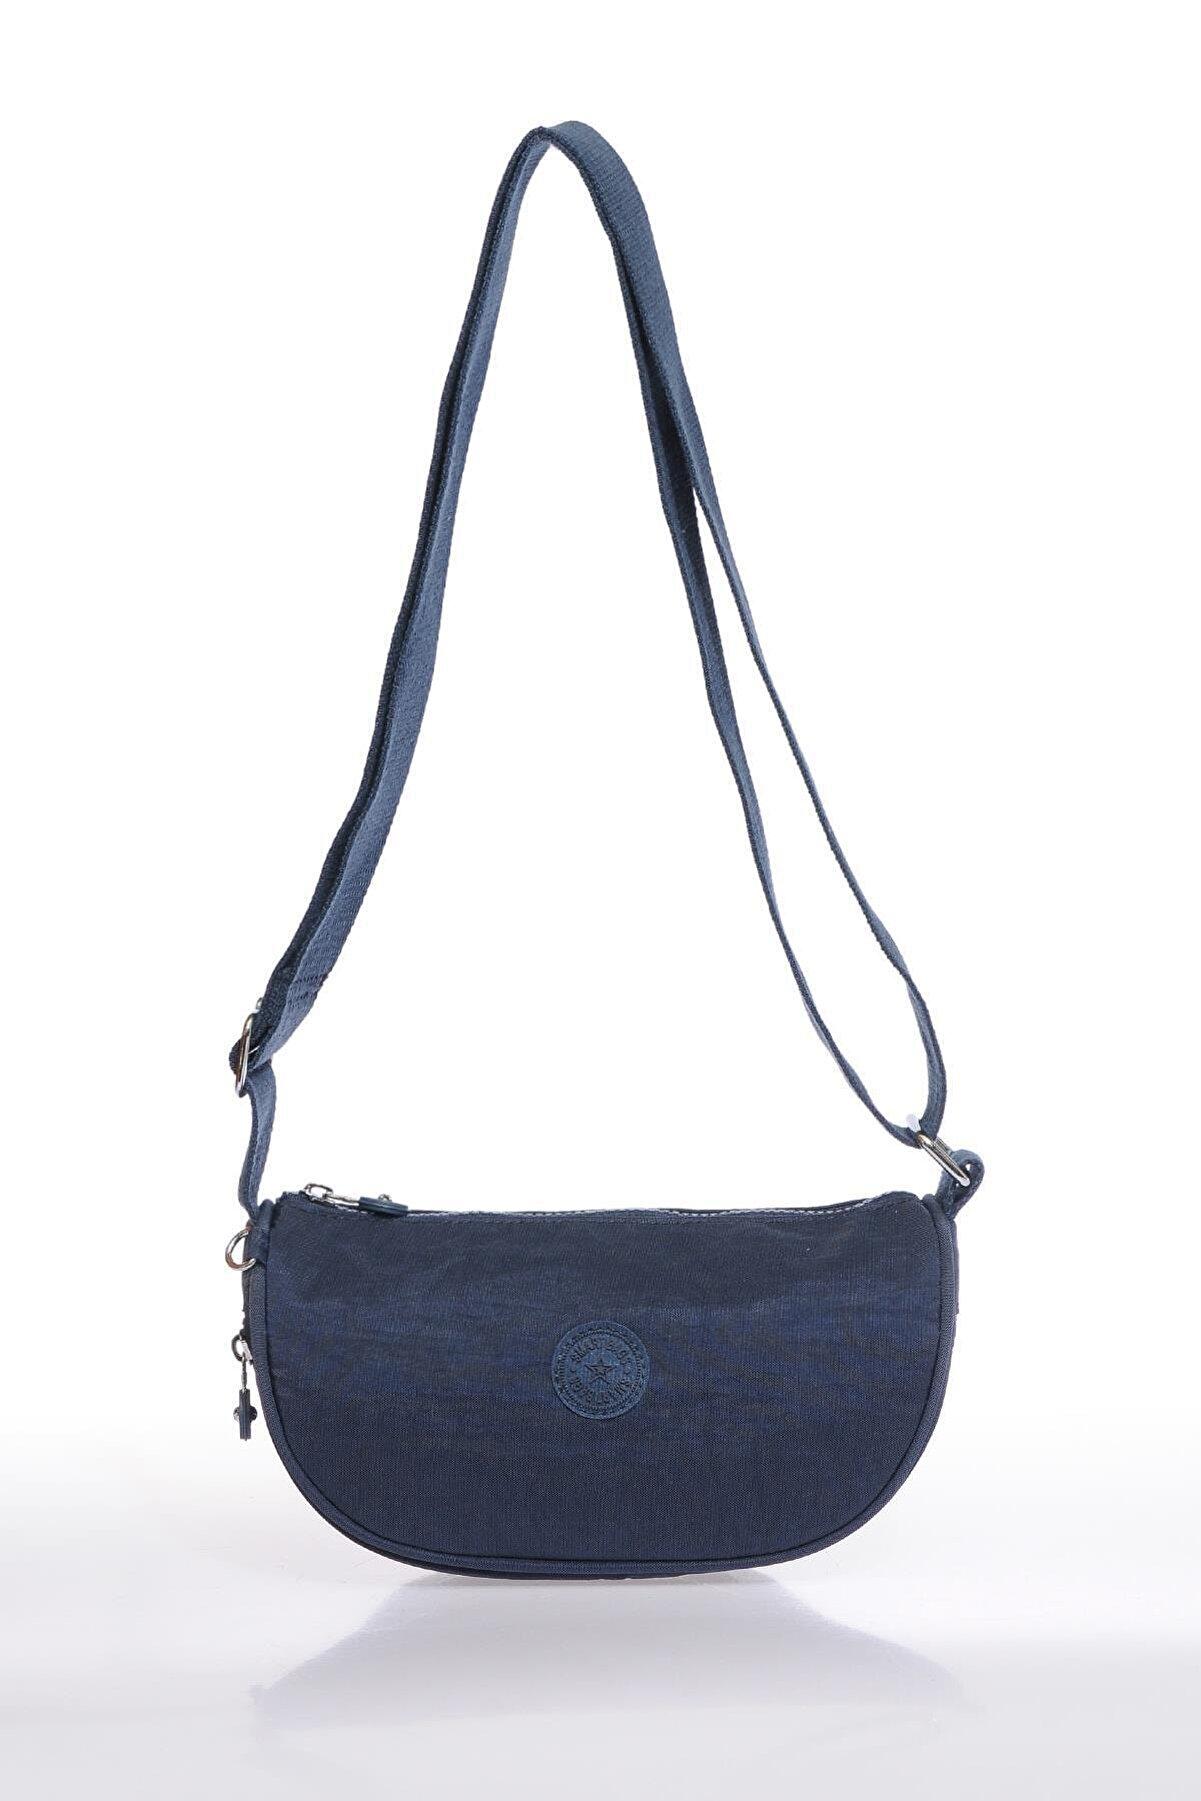 Smart Bags Smb3026-0033 Lacivert Kadın Çapraz Çanta